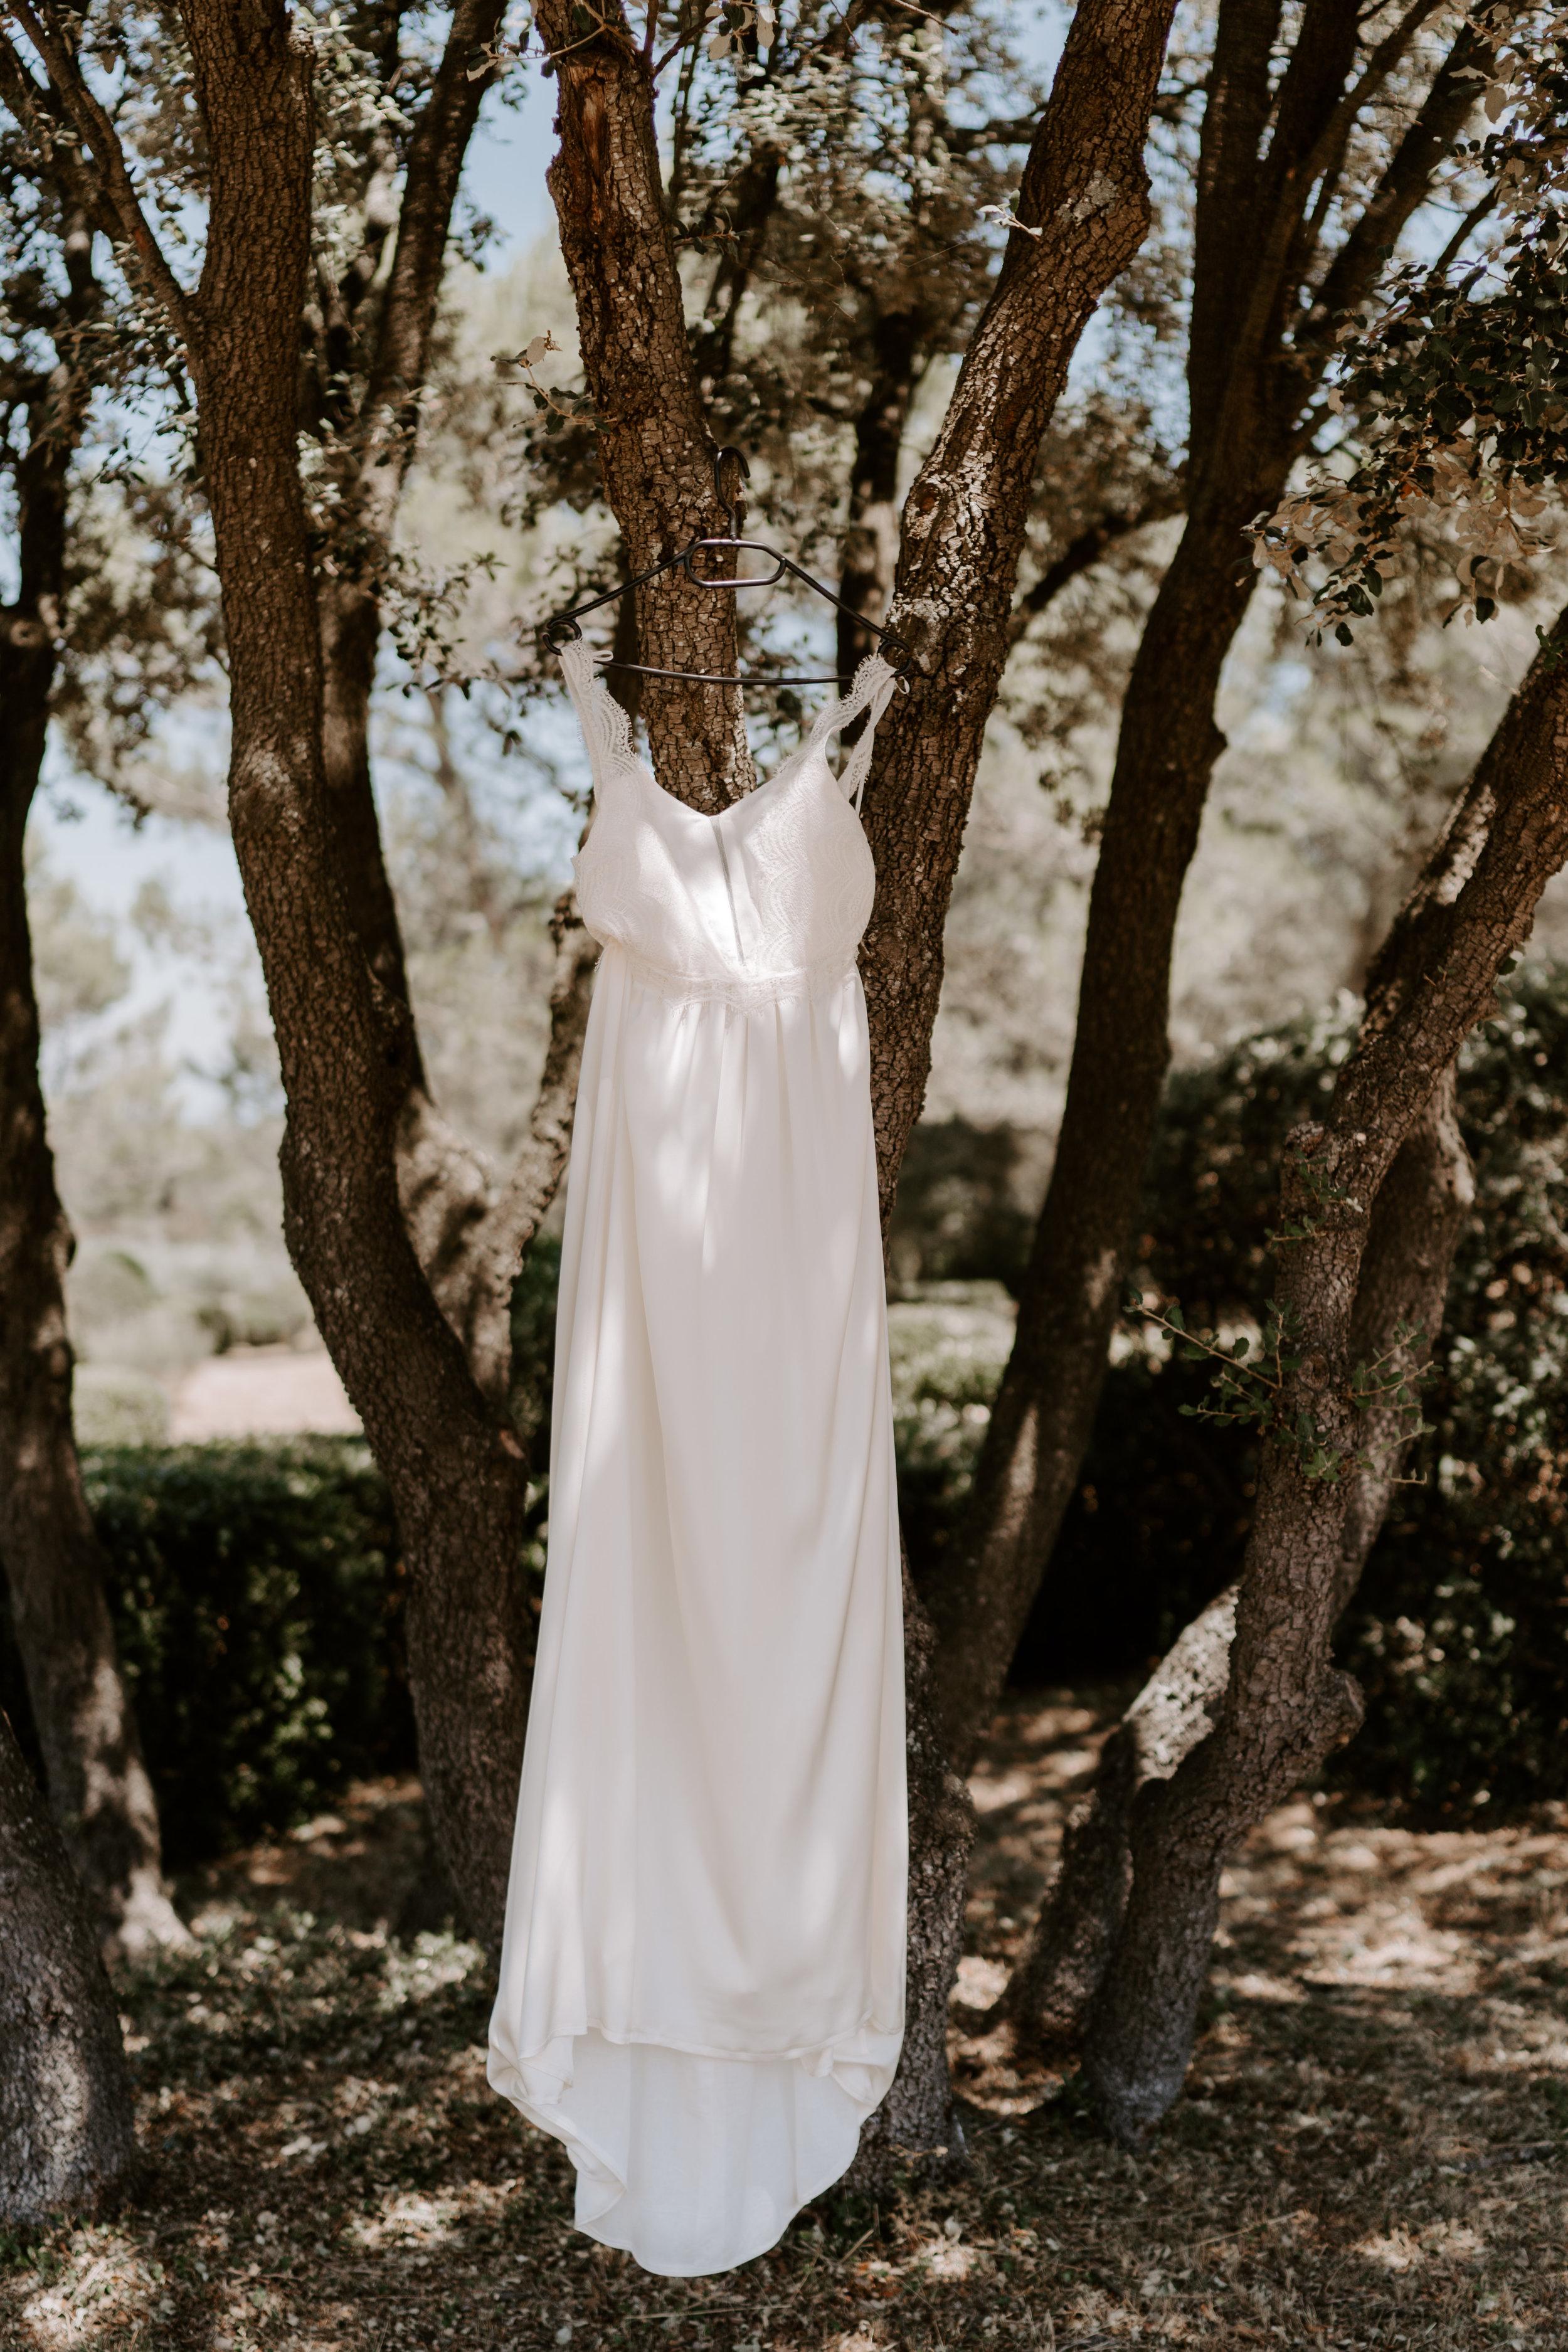 elsacaza_photographe_mariage_Juliette_Nicolas.jpg